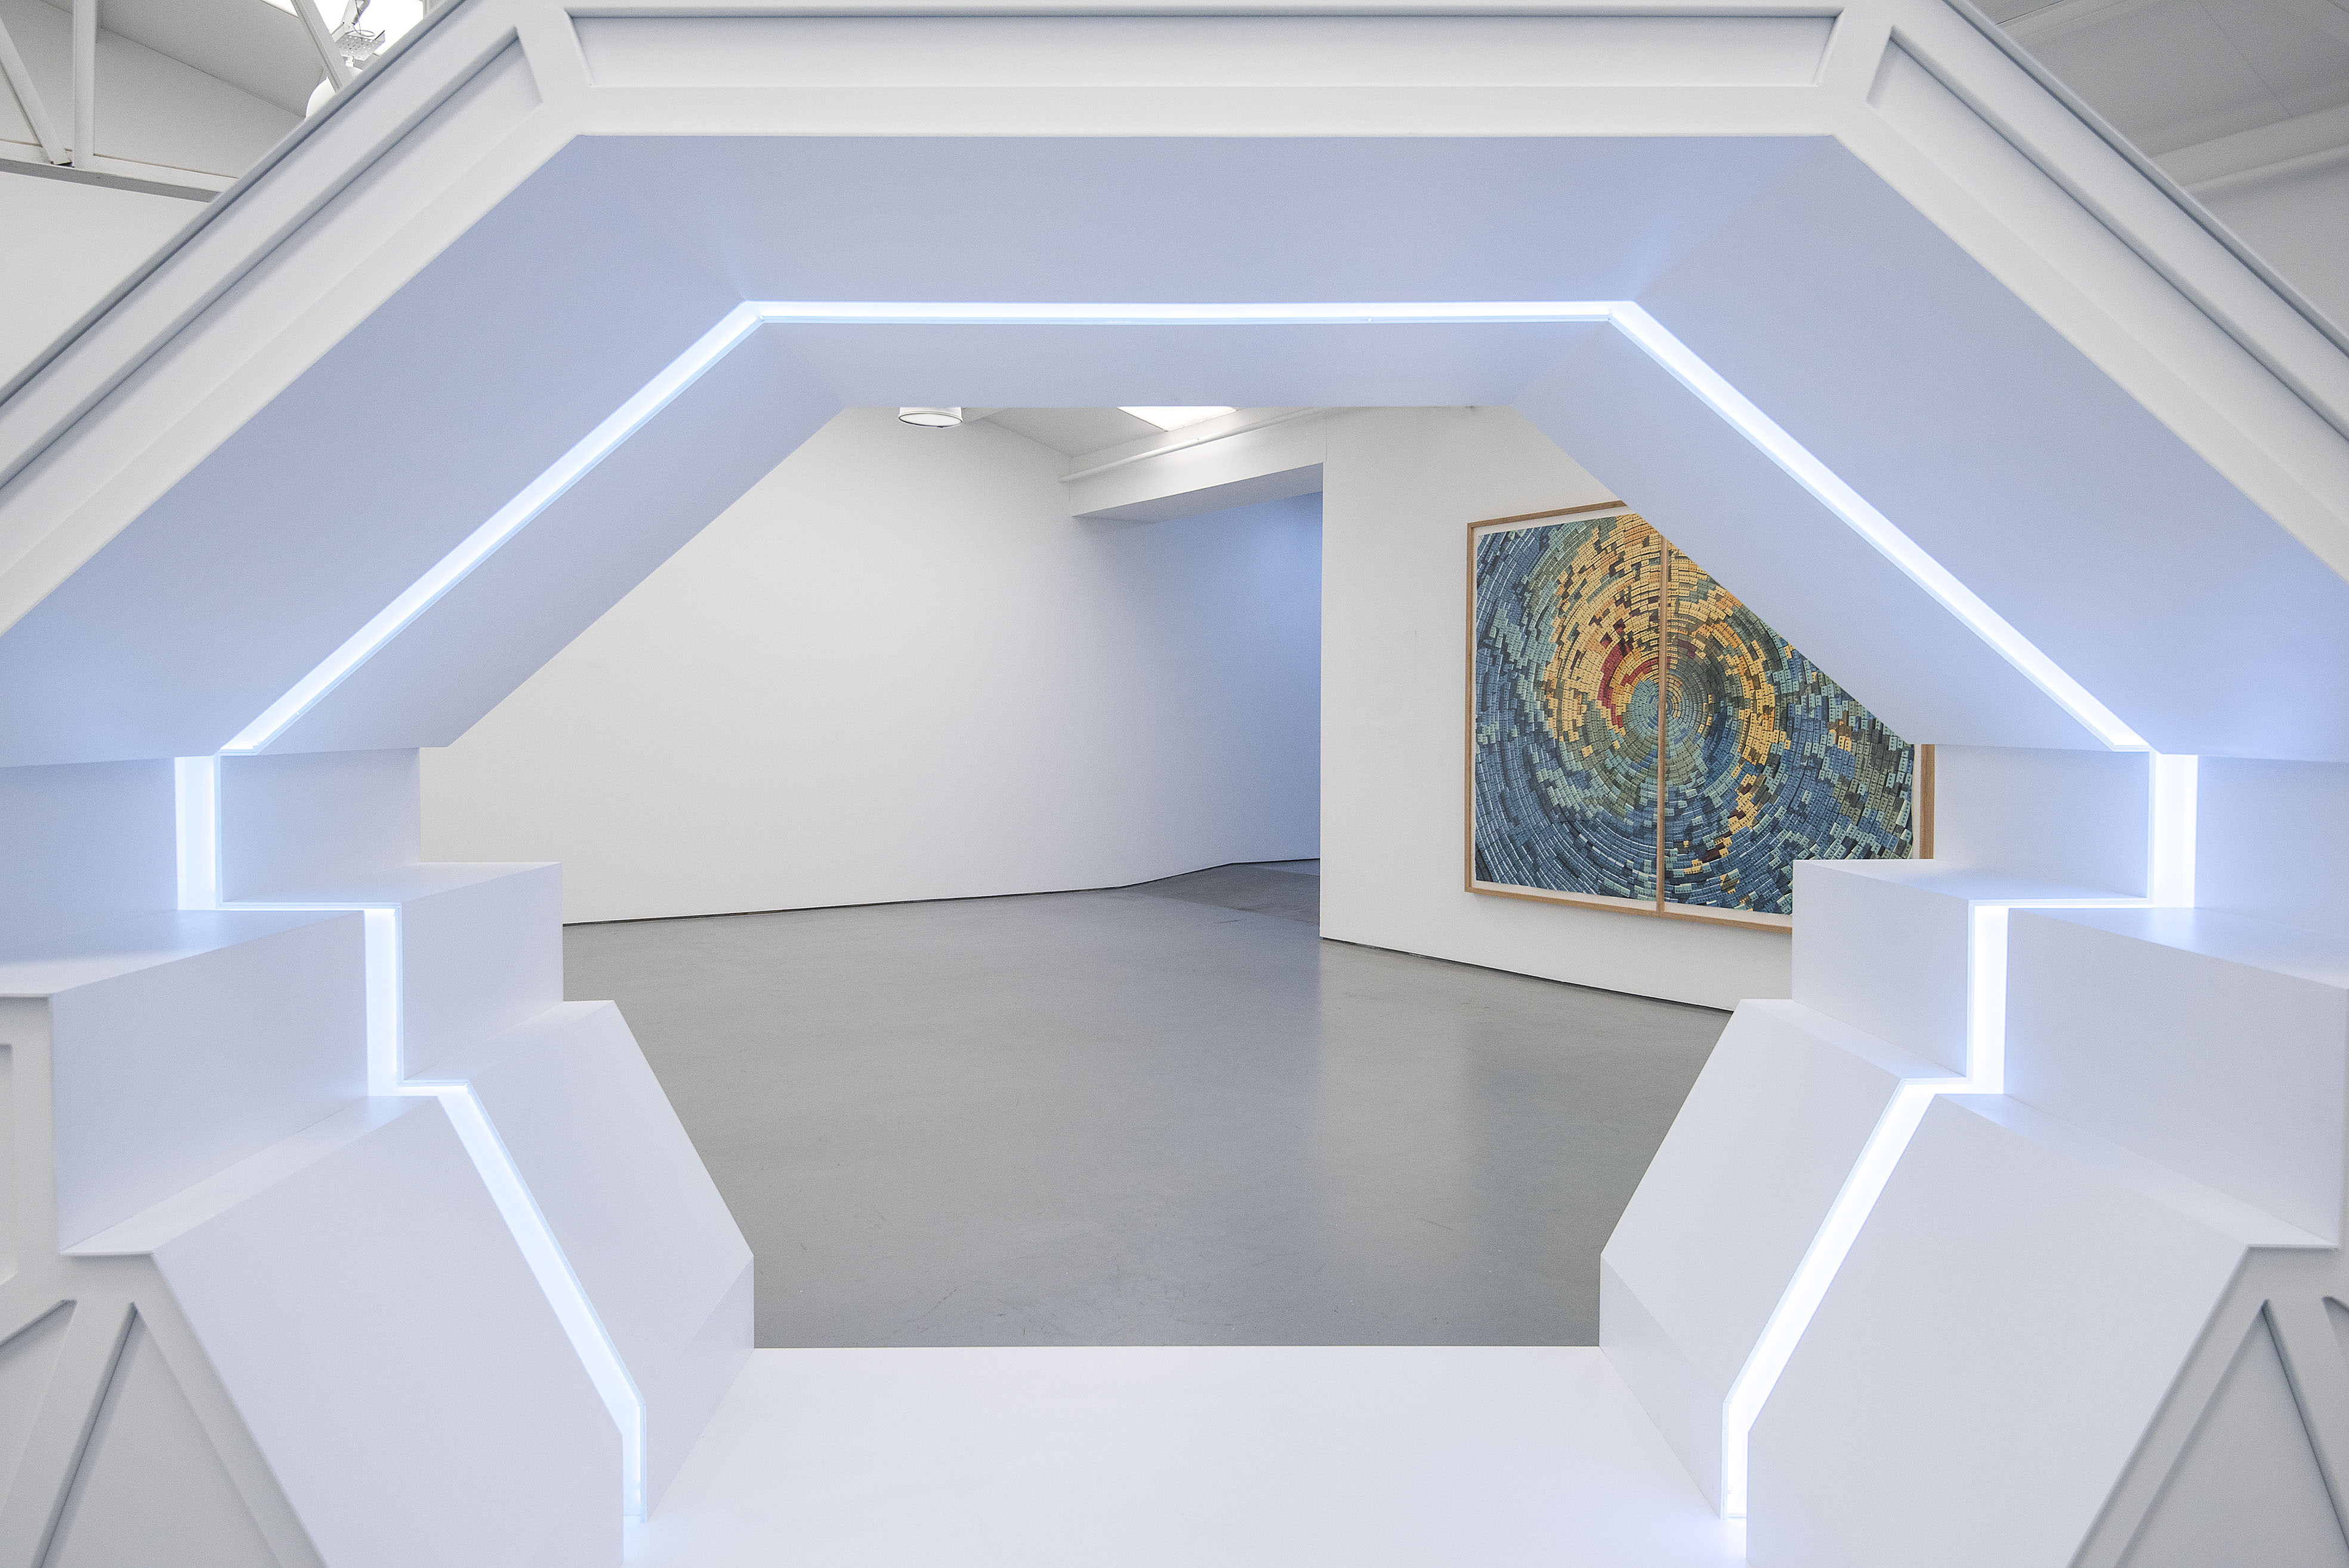 Dagoberto Rodríguez, Galería Sabrina Amrani